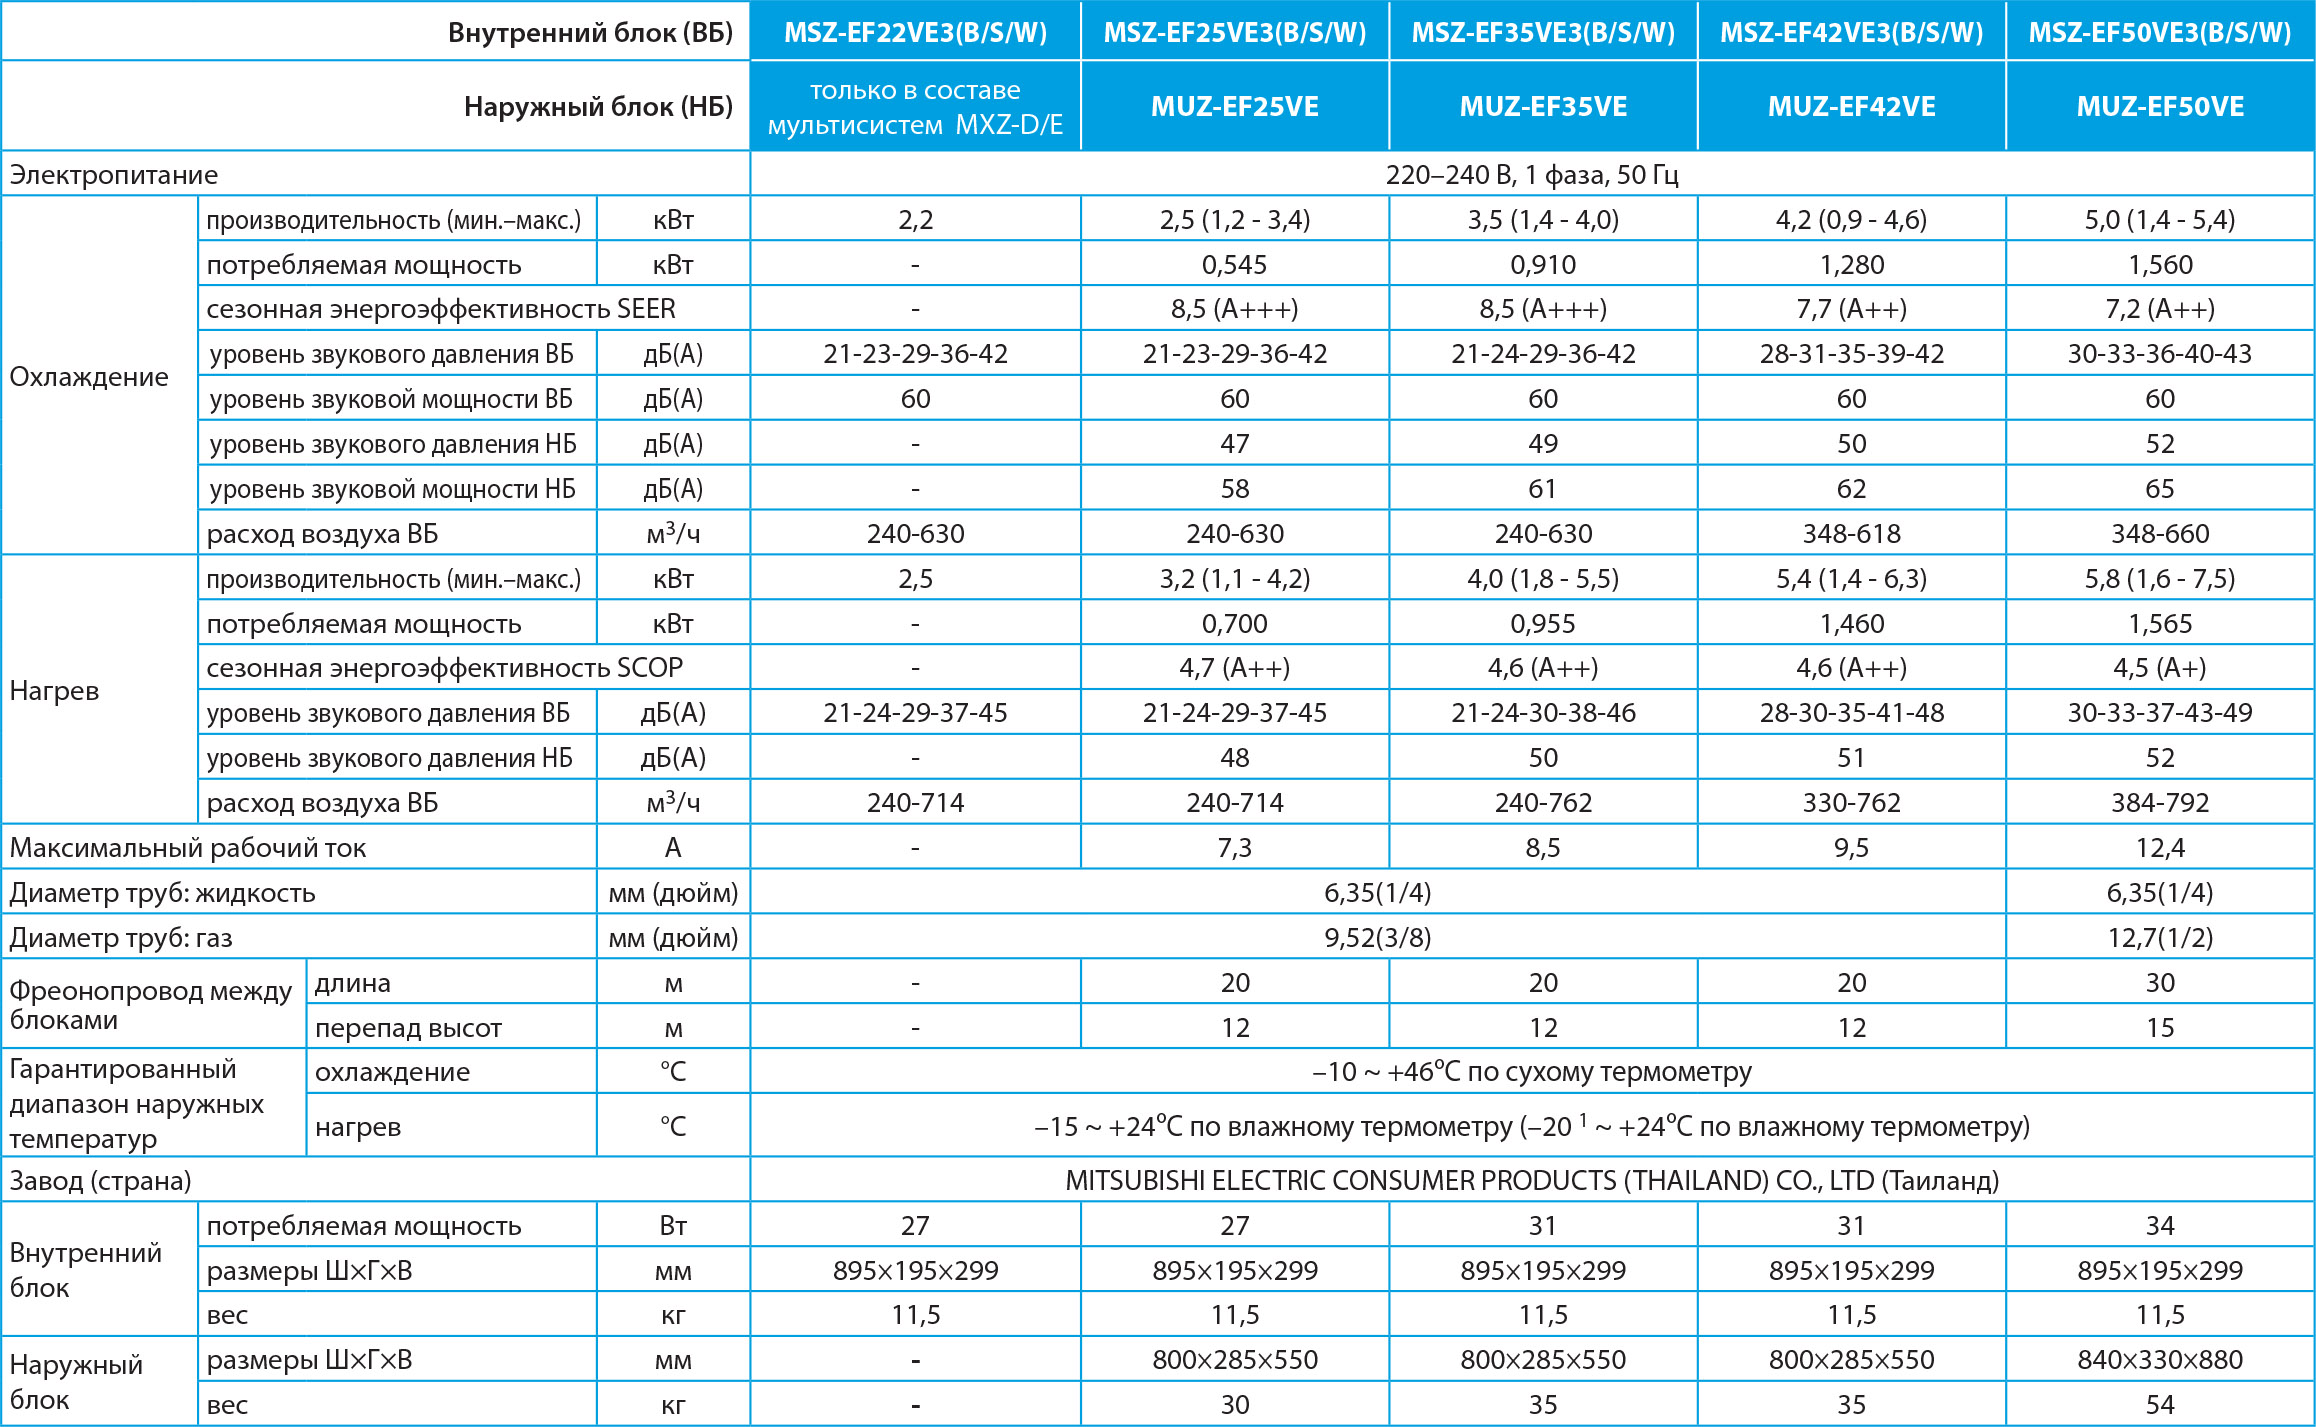 Технические характеристики кондиционера Mitsubishi Electric MSZ-EF42VEW / MUZ-EF42VE серии Design Inverter